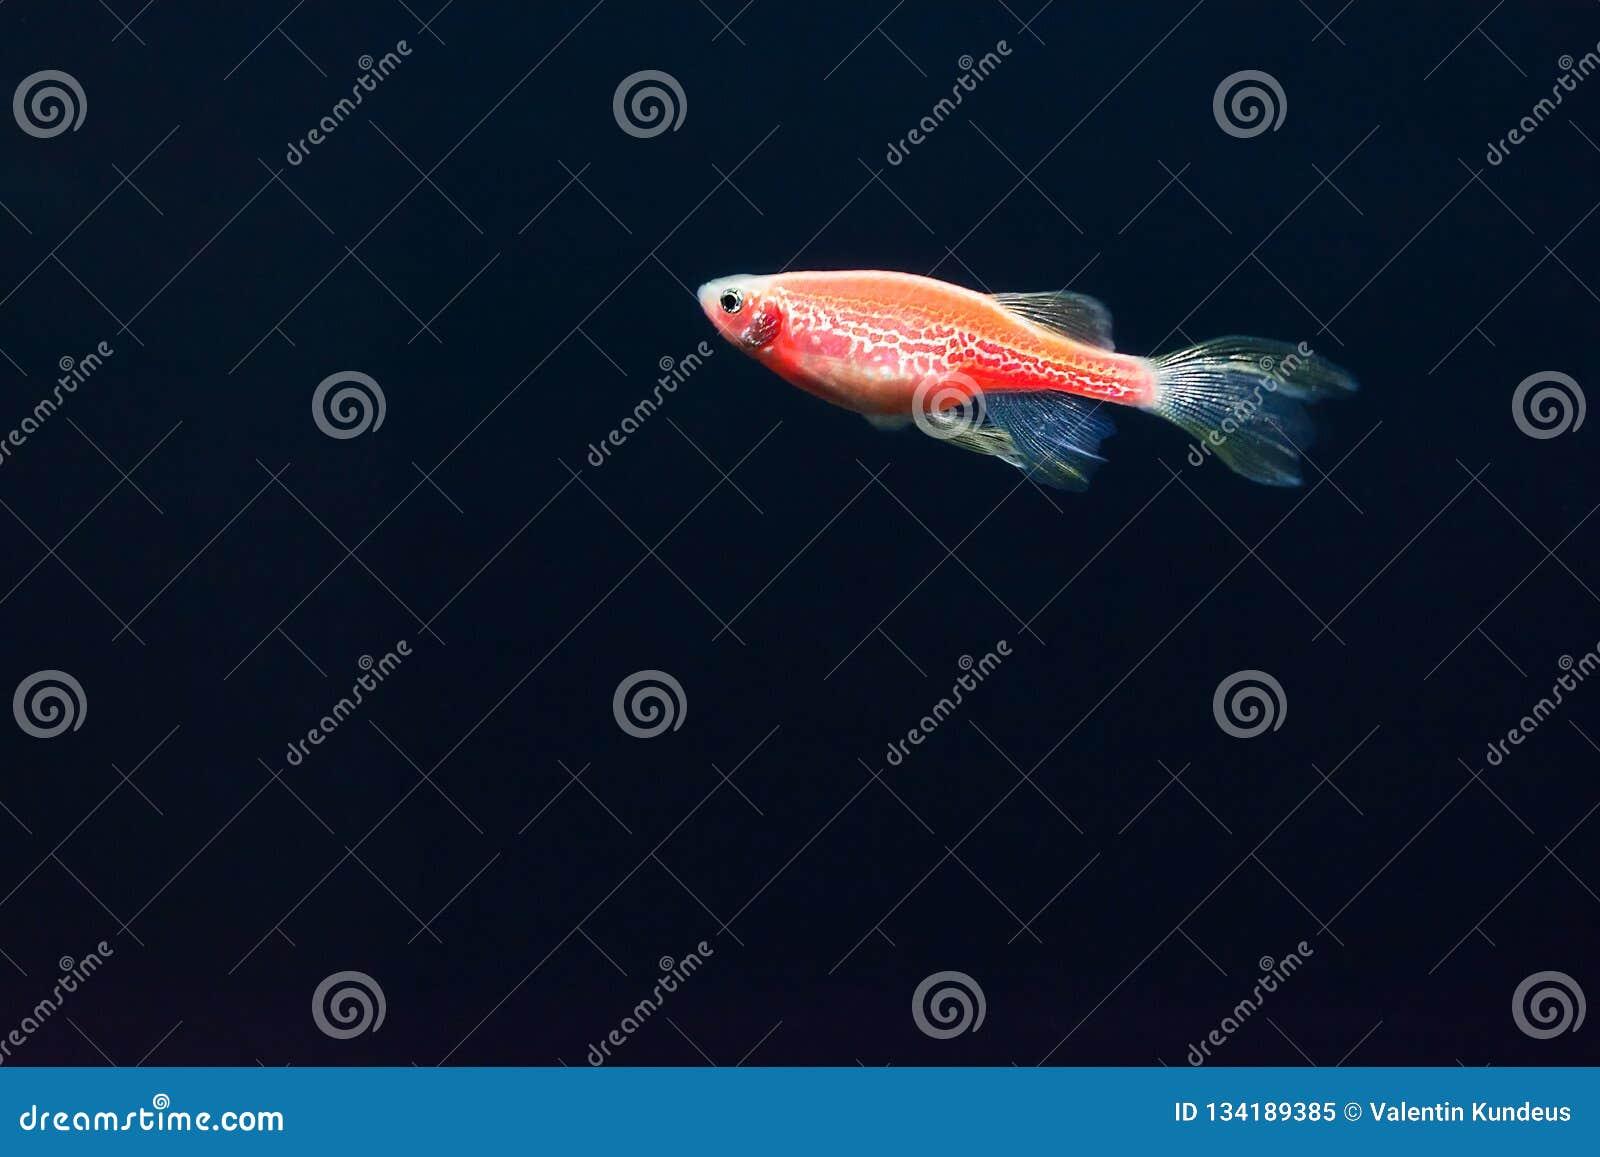 Red zebrafish on a dark blue background. Genetically modified glowing fish. Danio fish